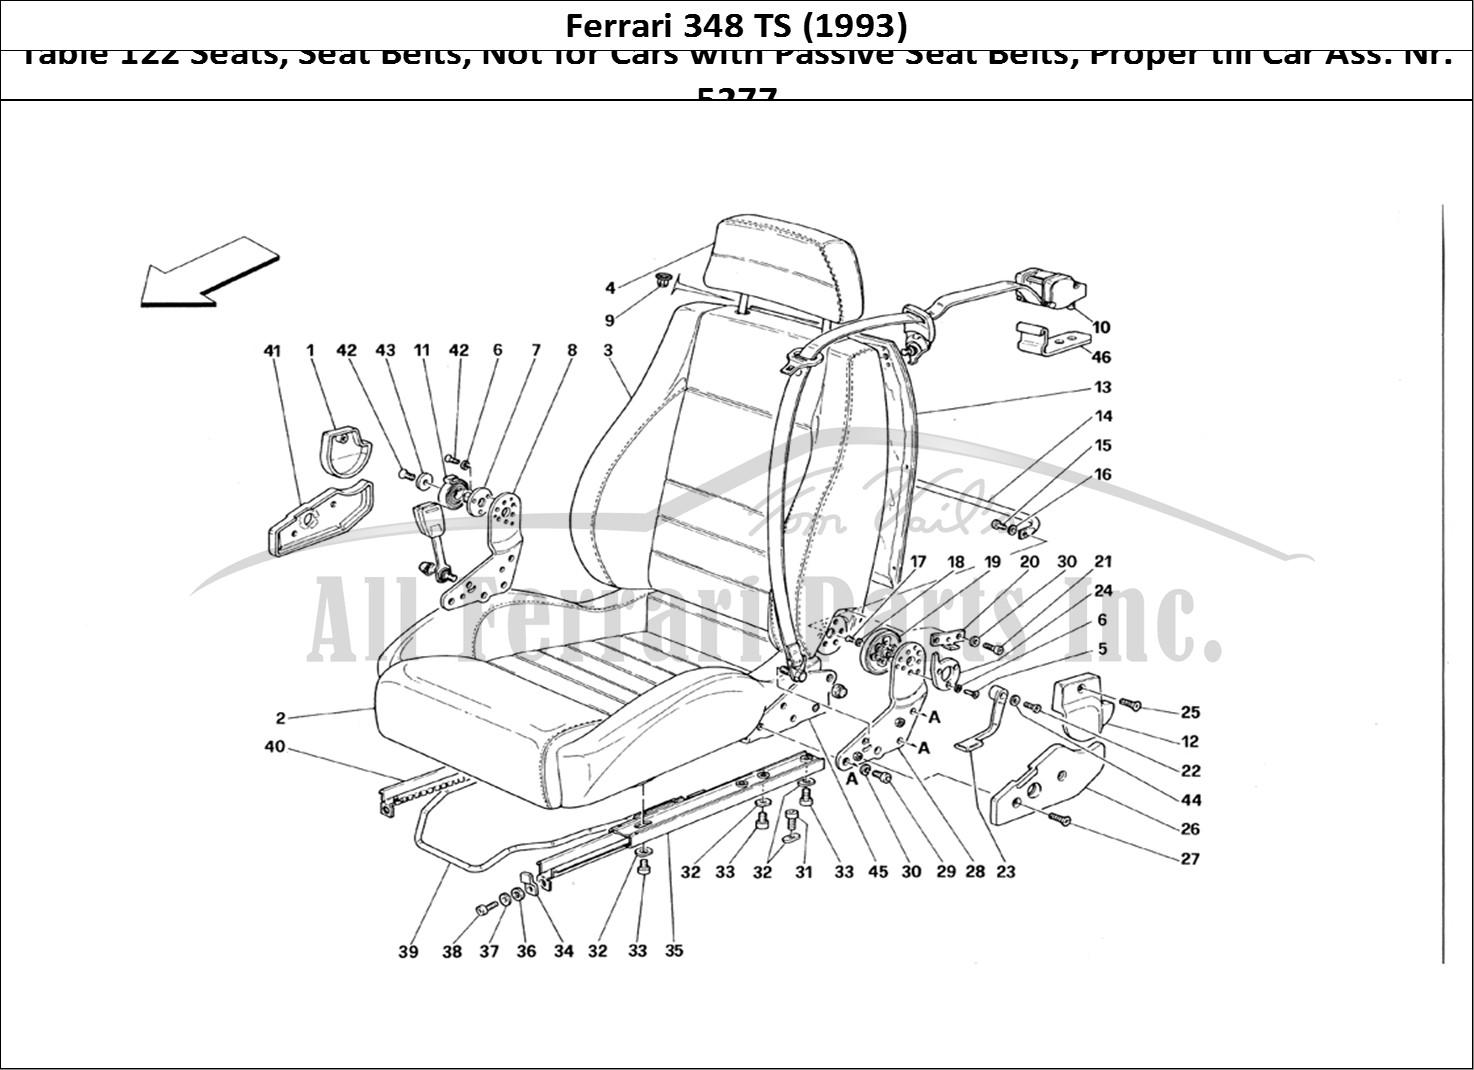 Buy Original Ferrari 348 Ts 122 Seats Seat Belts